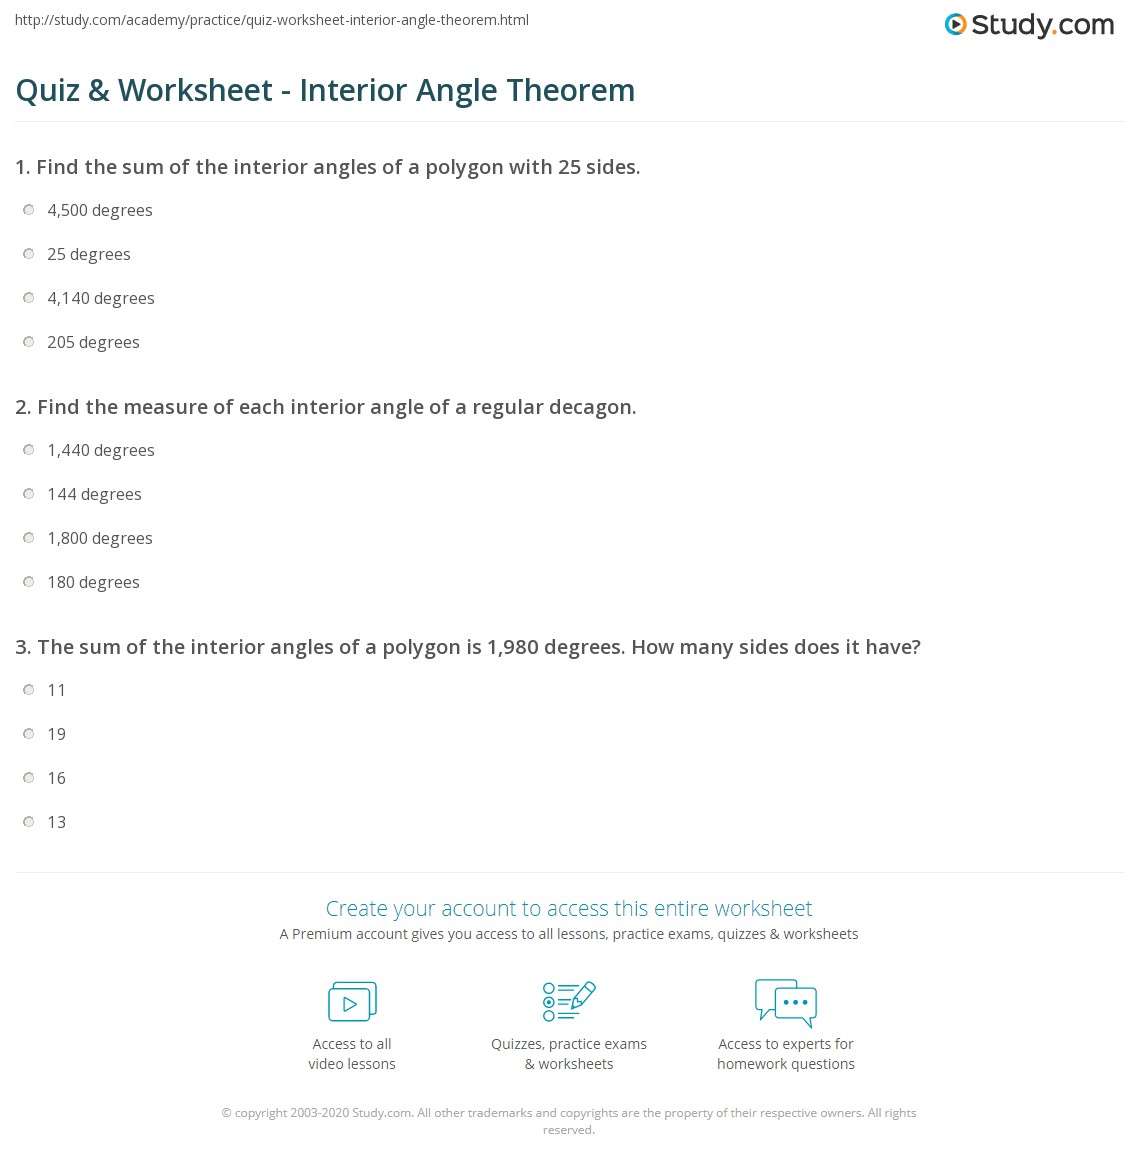 worksheet Interior Angles Of A Polygon Worksheet quiz worksheet interior angle theorem study com print definition formula worksheet